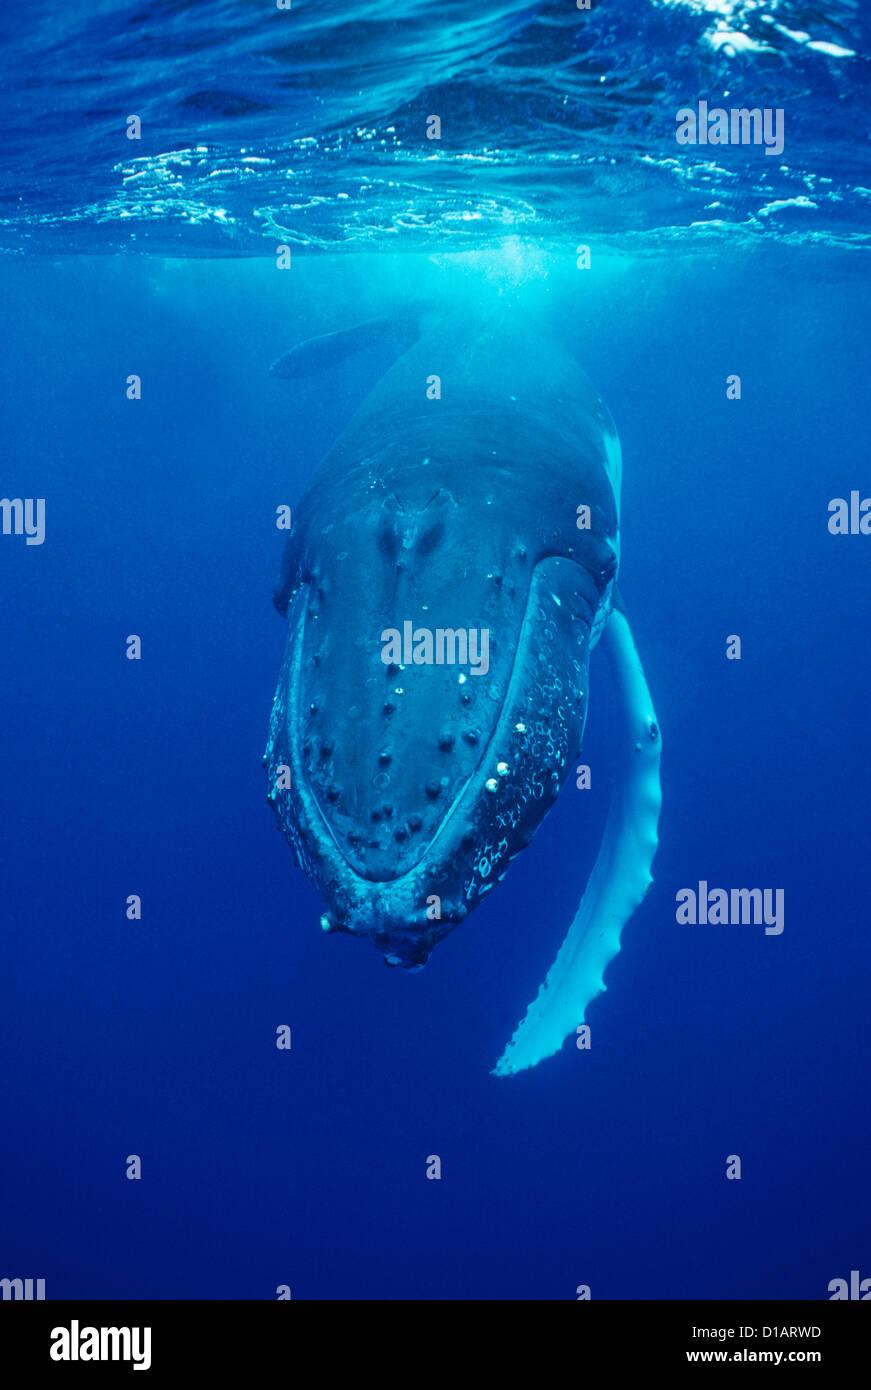 Humpback whale.Megaptera novaeangliae. Francois Gohier - Stock Image